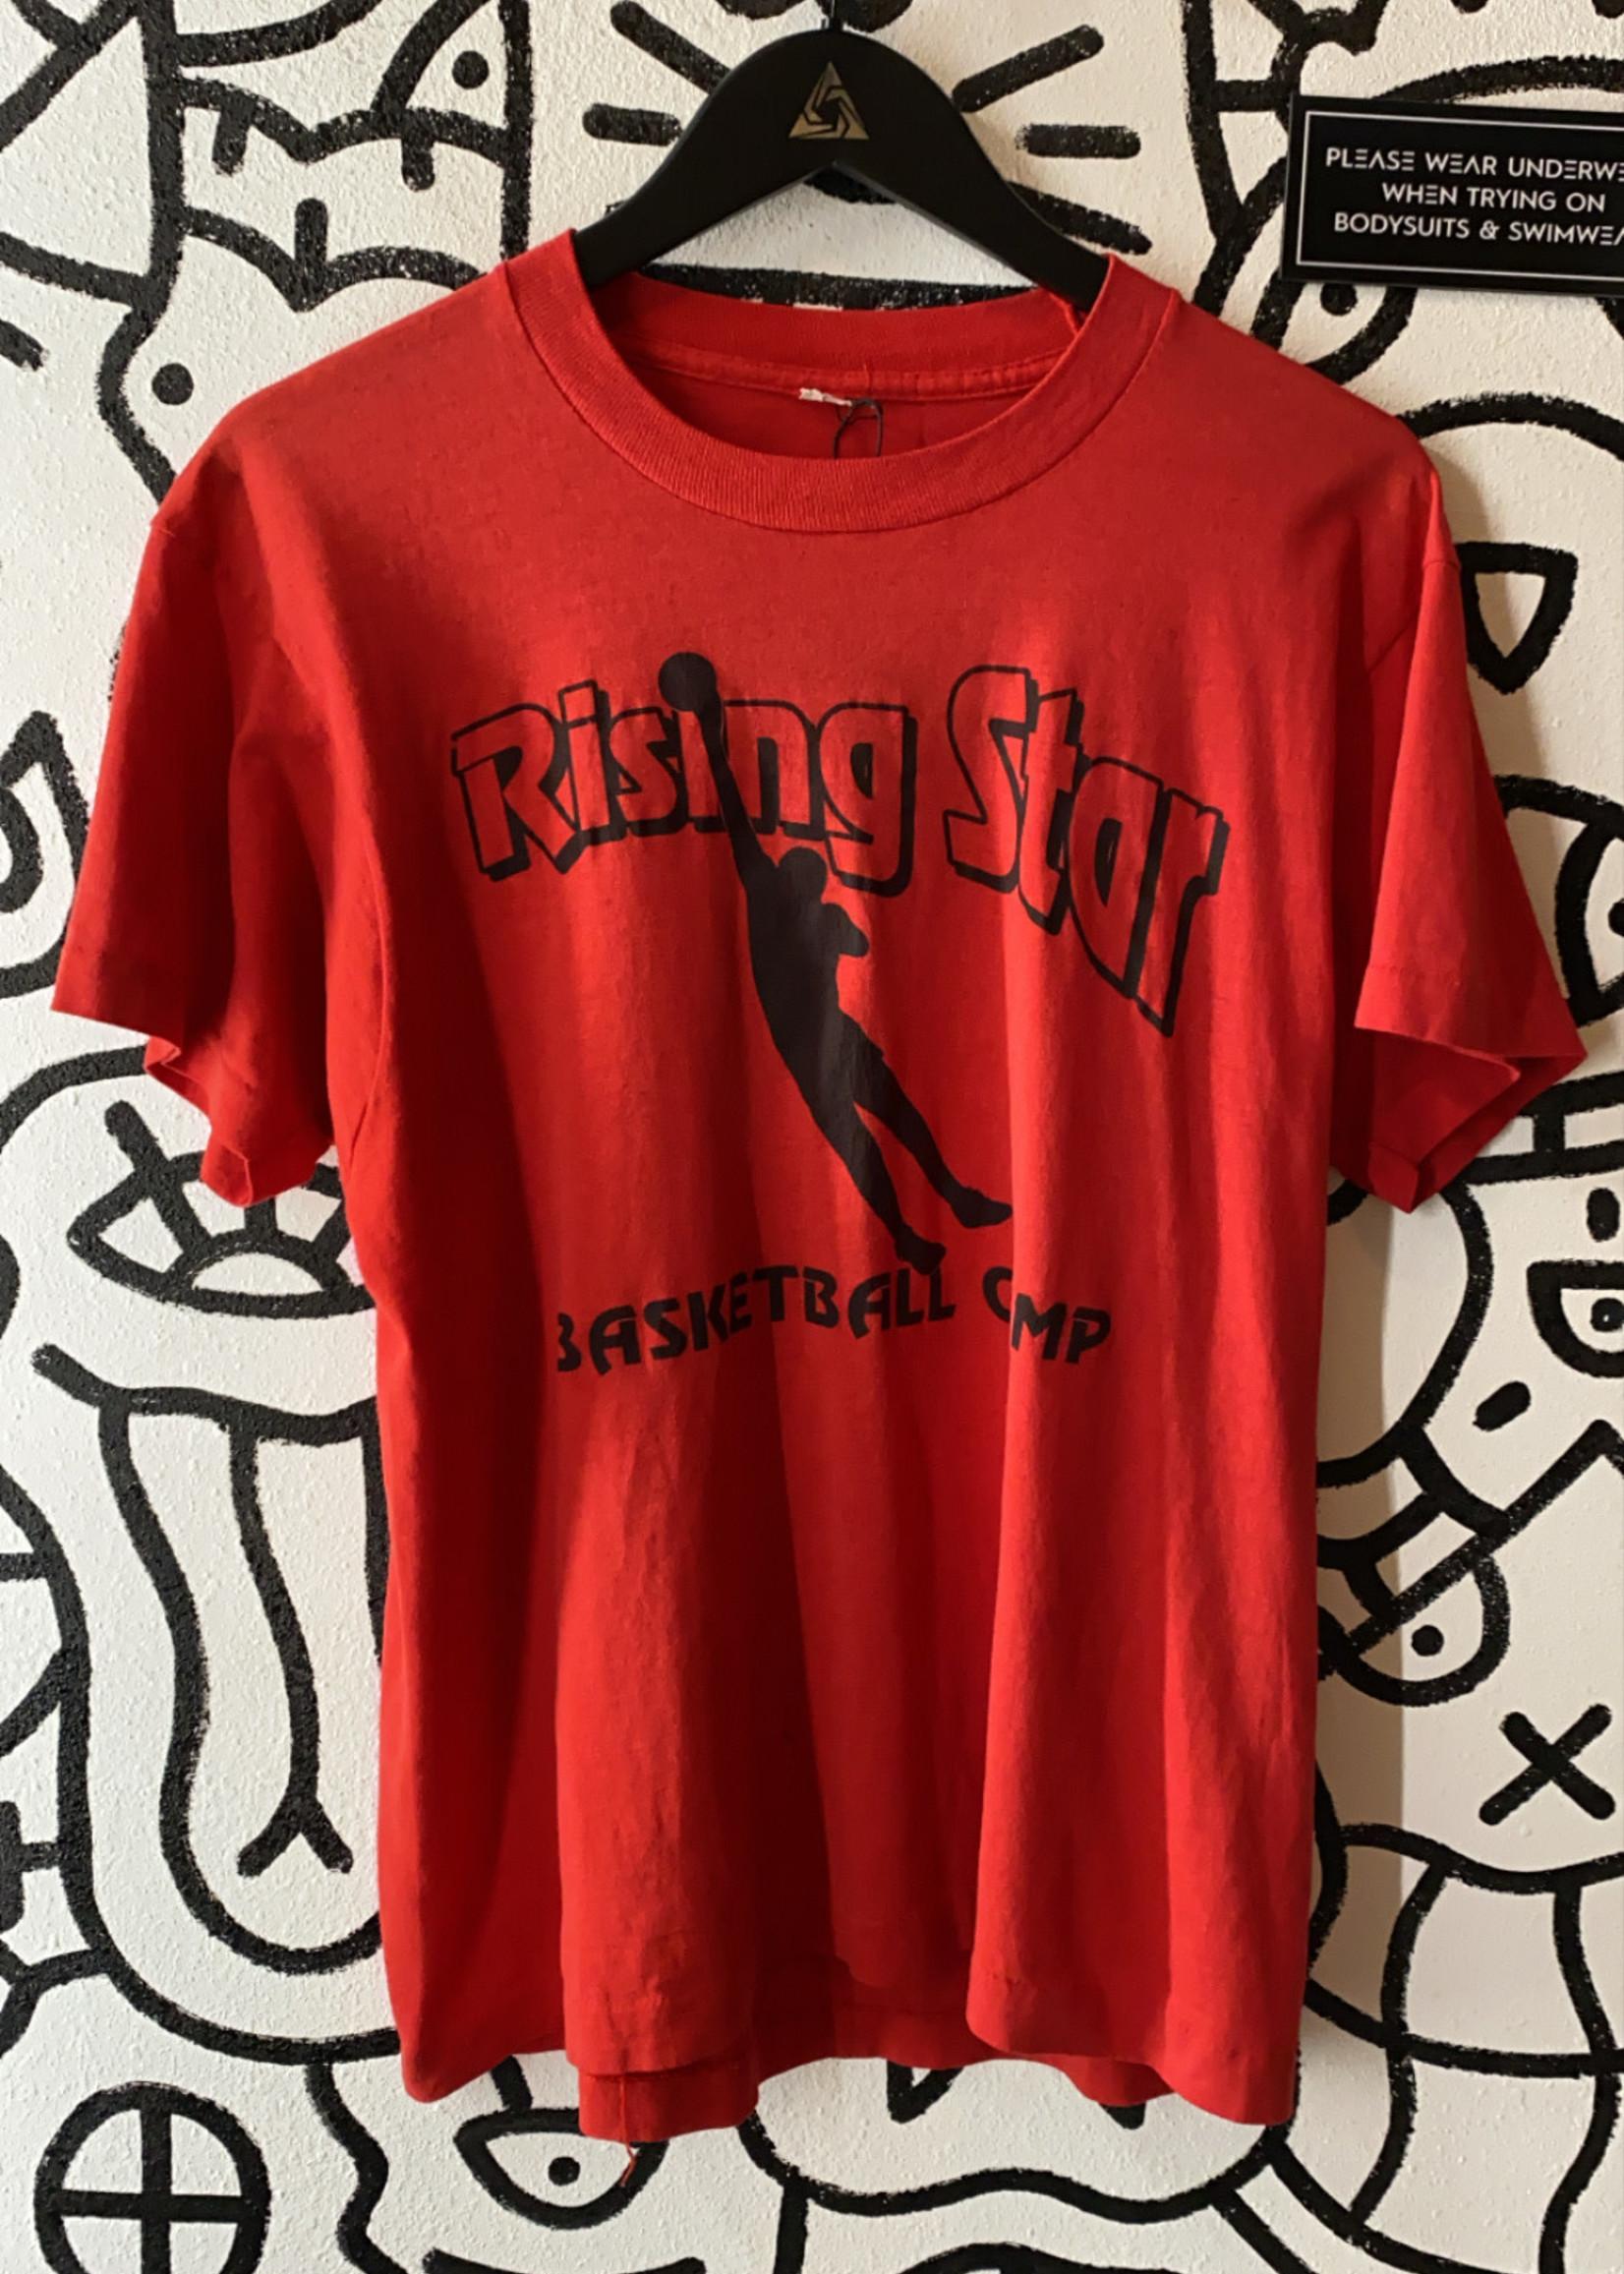 Vintage Rising Star Red Shirt M